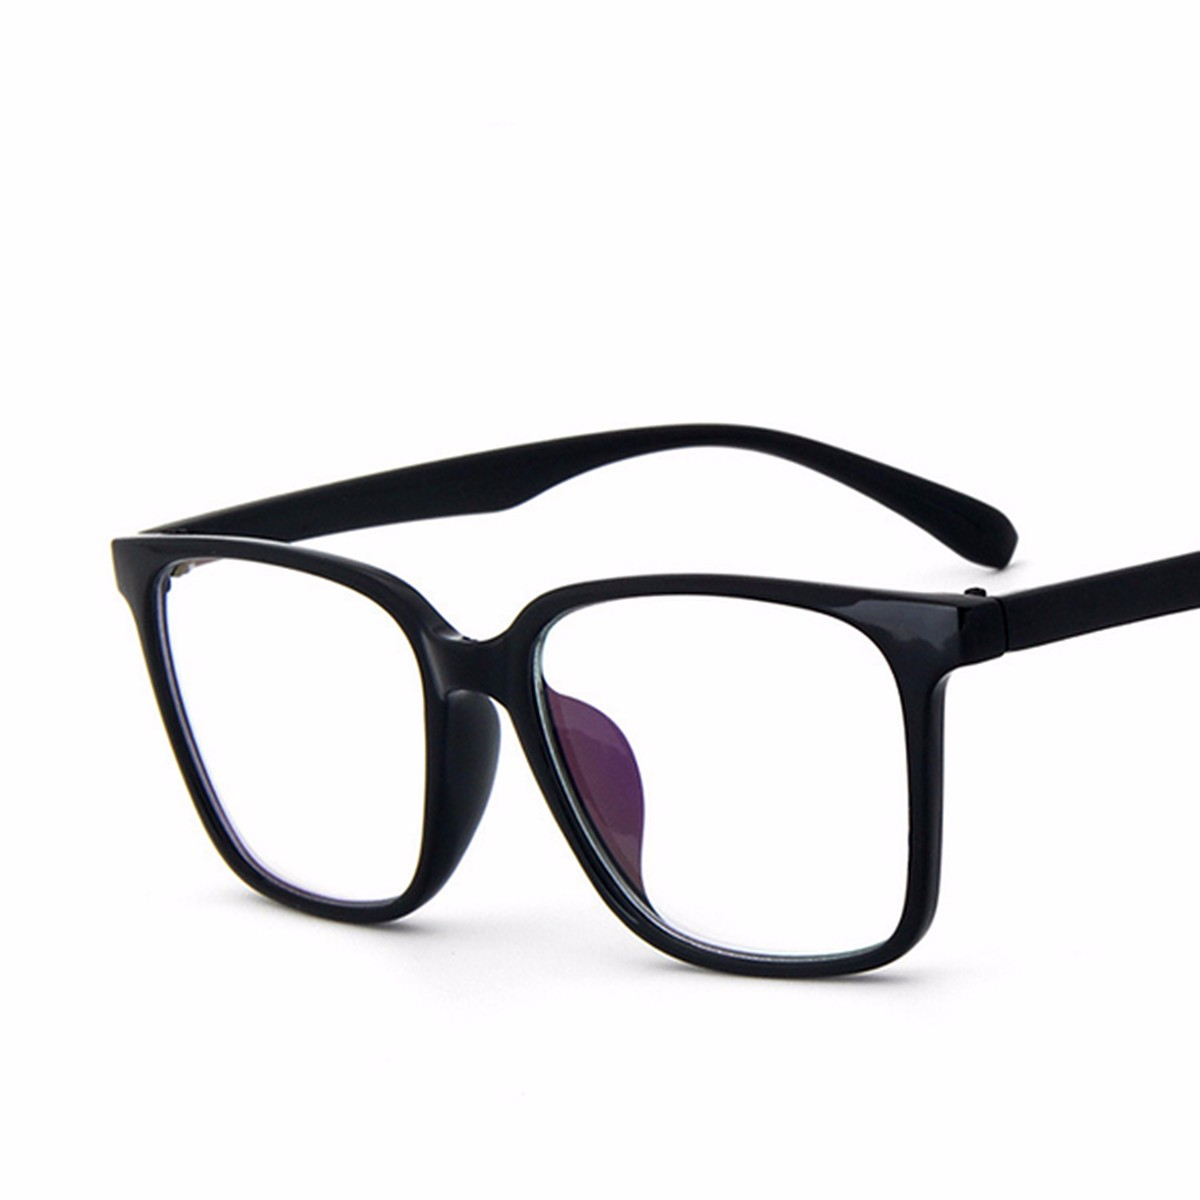 Fashion Men Women Square Full Frame Clear Lens Glasses PC Eyewear ...